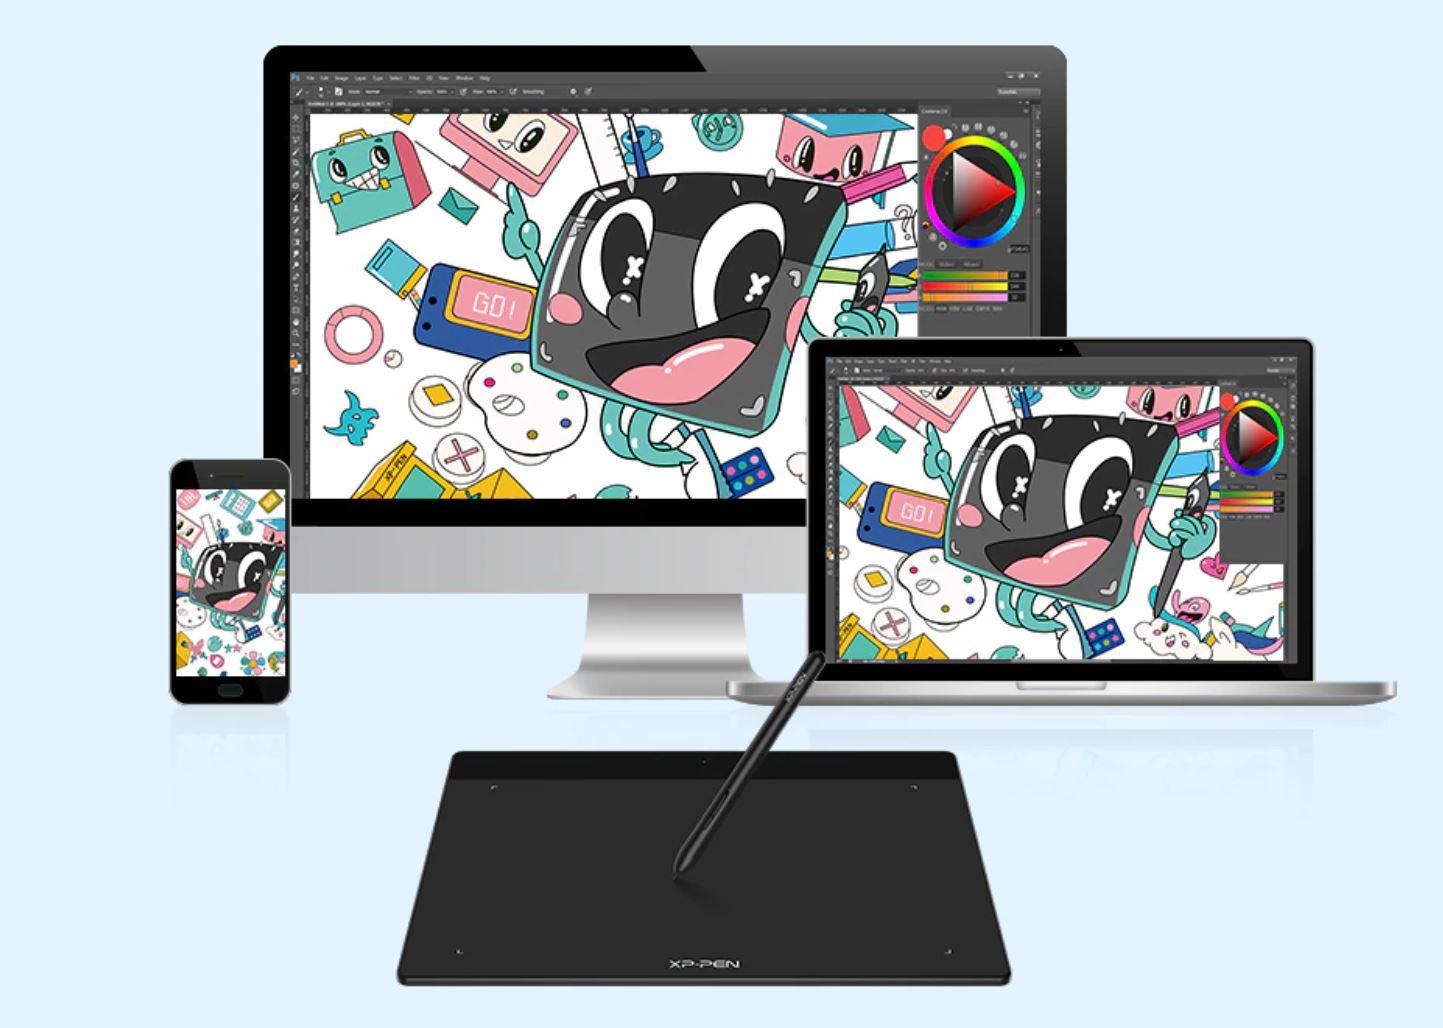 komputer i akcesoria biurowe - promocja AliExpress - XP Pen Deco Fun Tablet graficzny